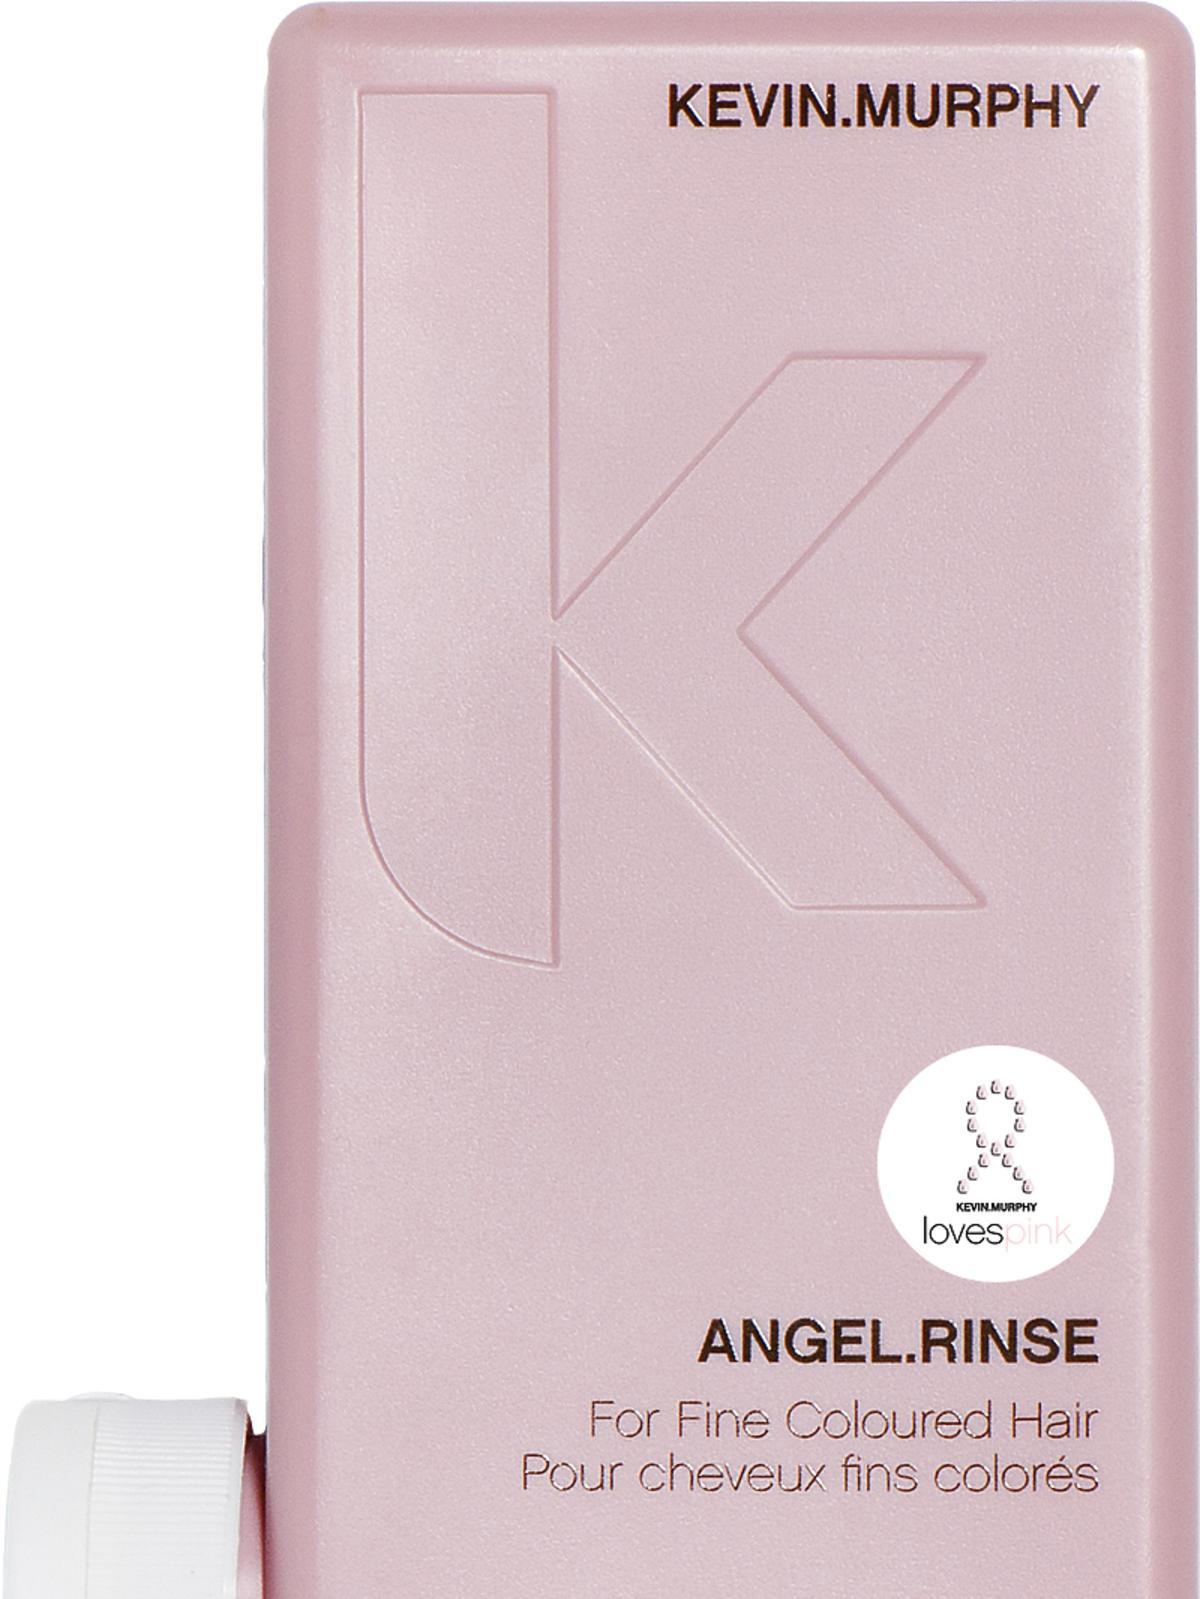 Odżywka Angel.Rinse, Kevin.Muprhy, 119 zł (Hair2go.pl)